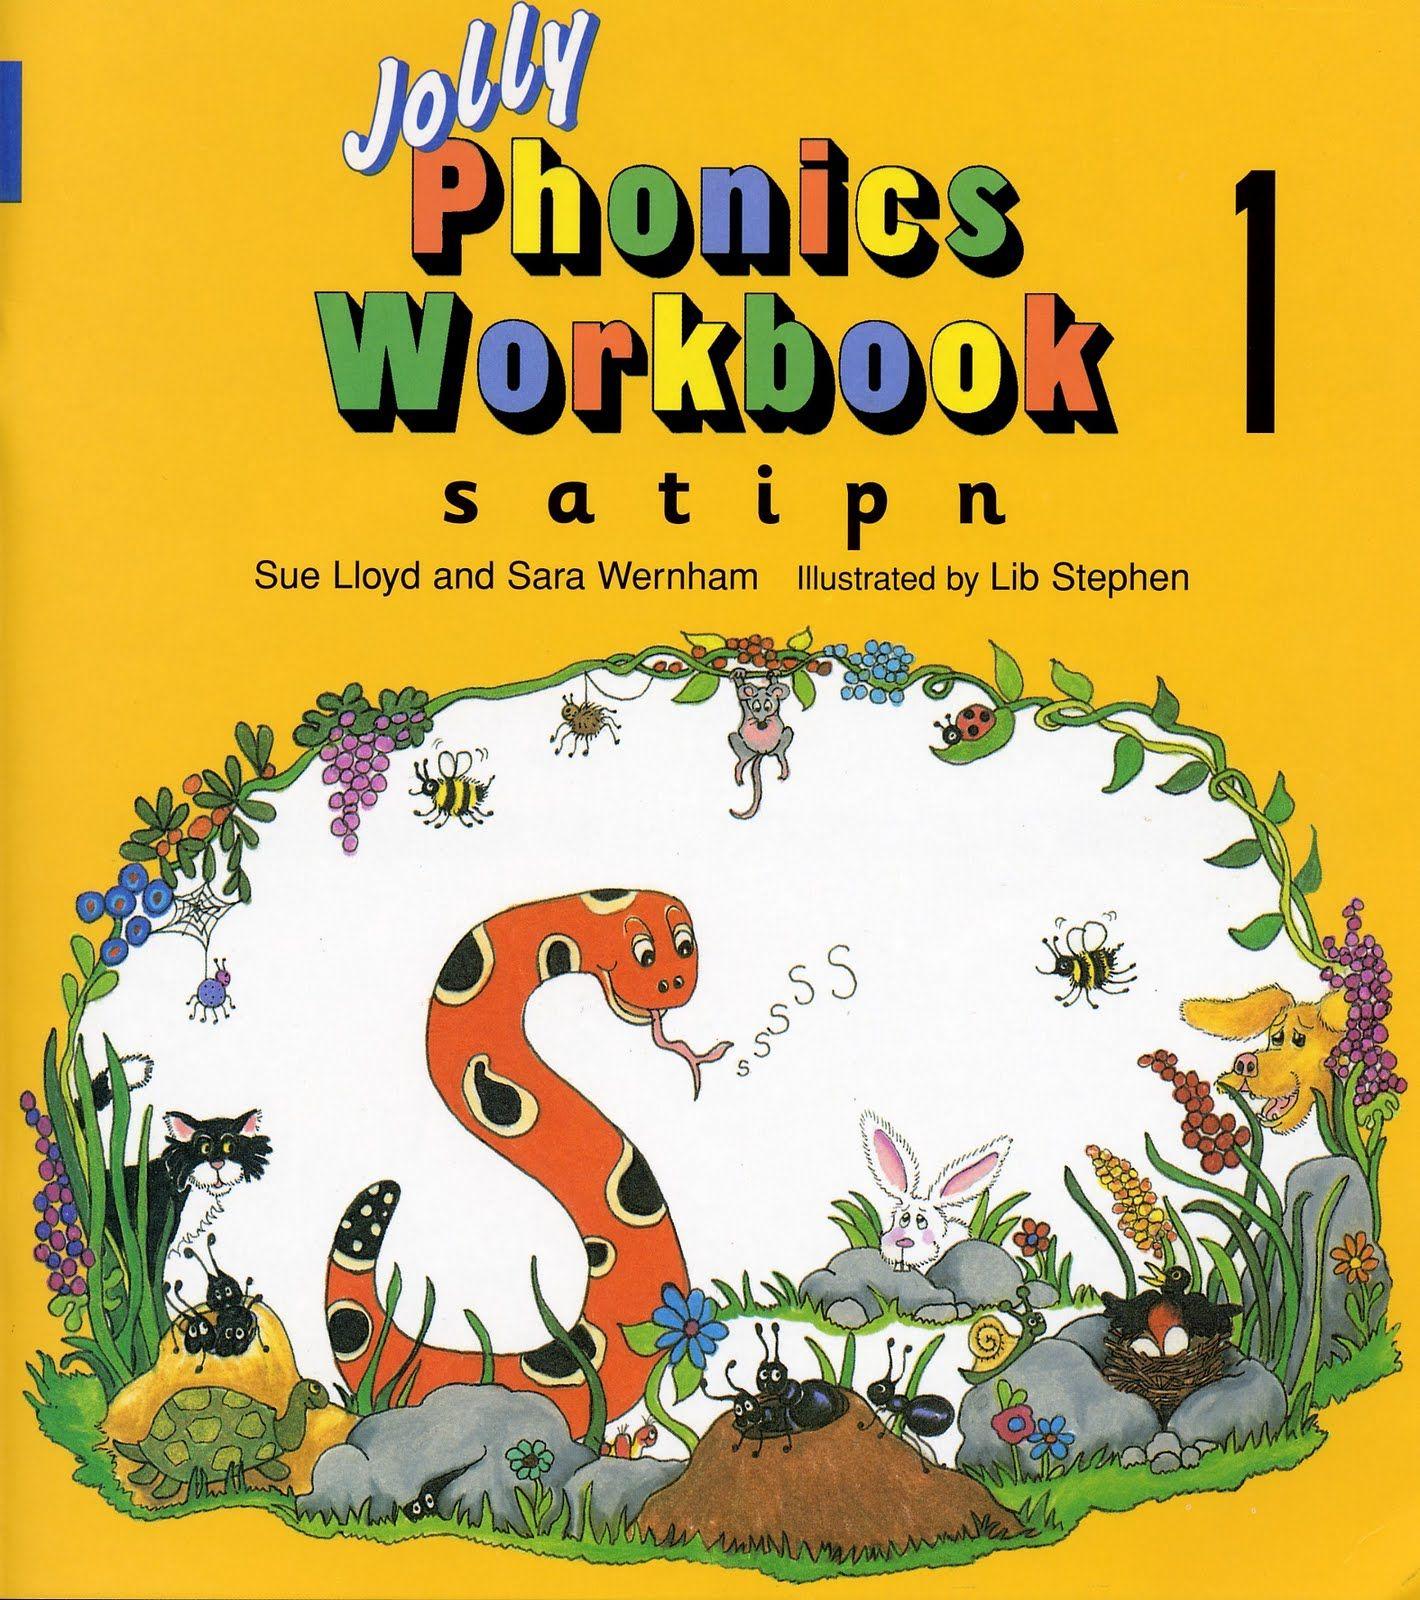 Fshare Jolly Phonics Workbook 1